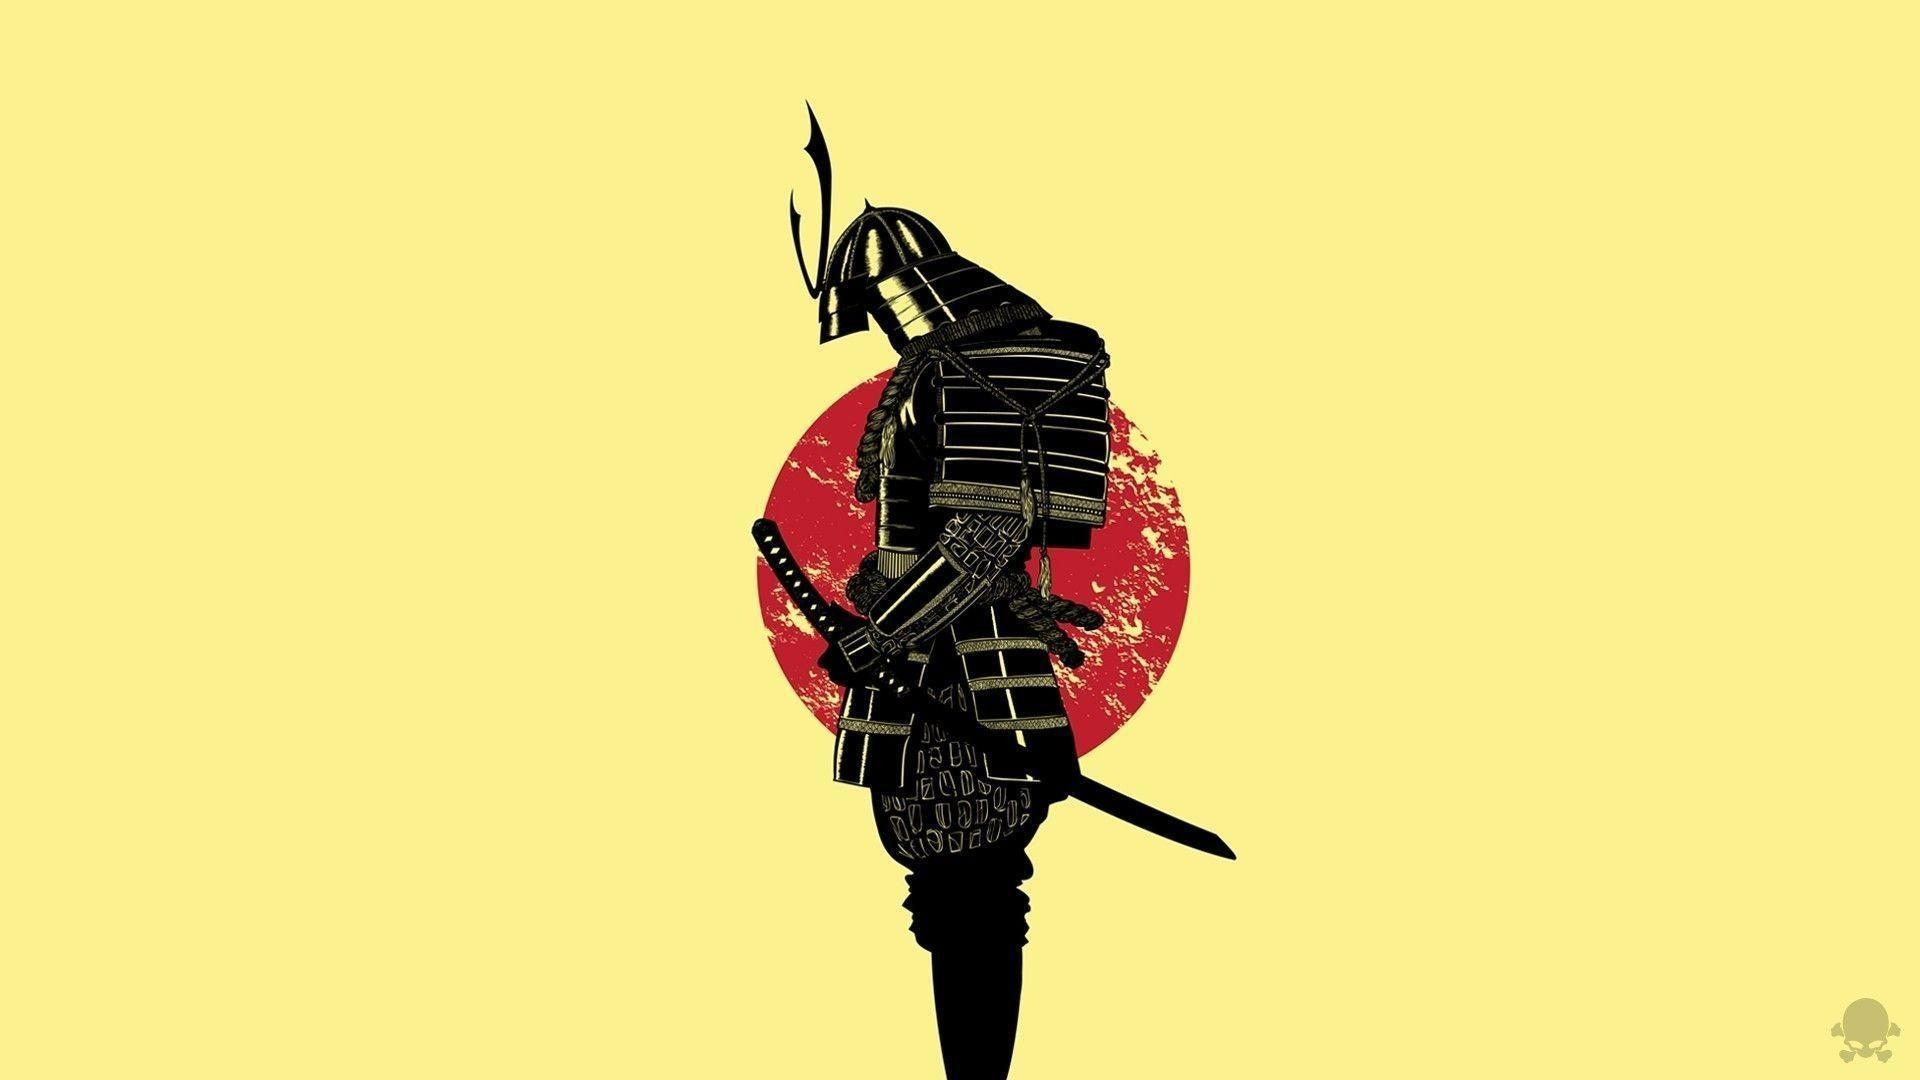 Res 1920x1080, Japanese Art Samurai Girl Wallpapers